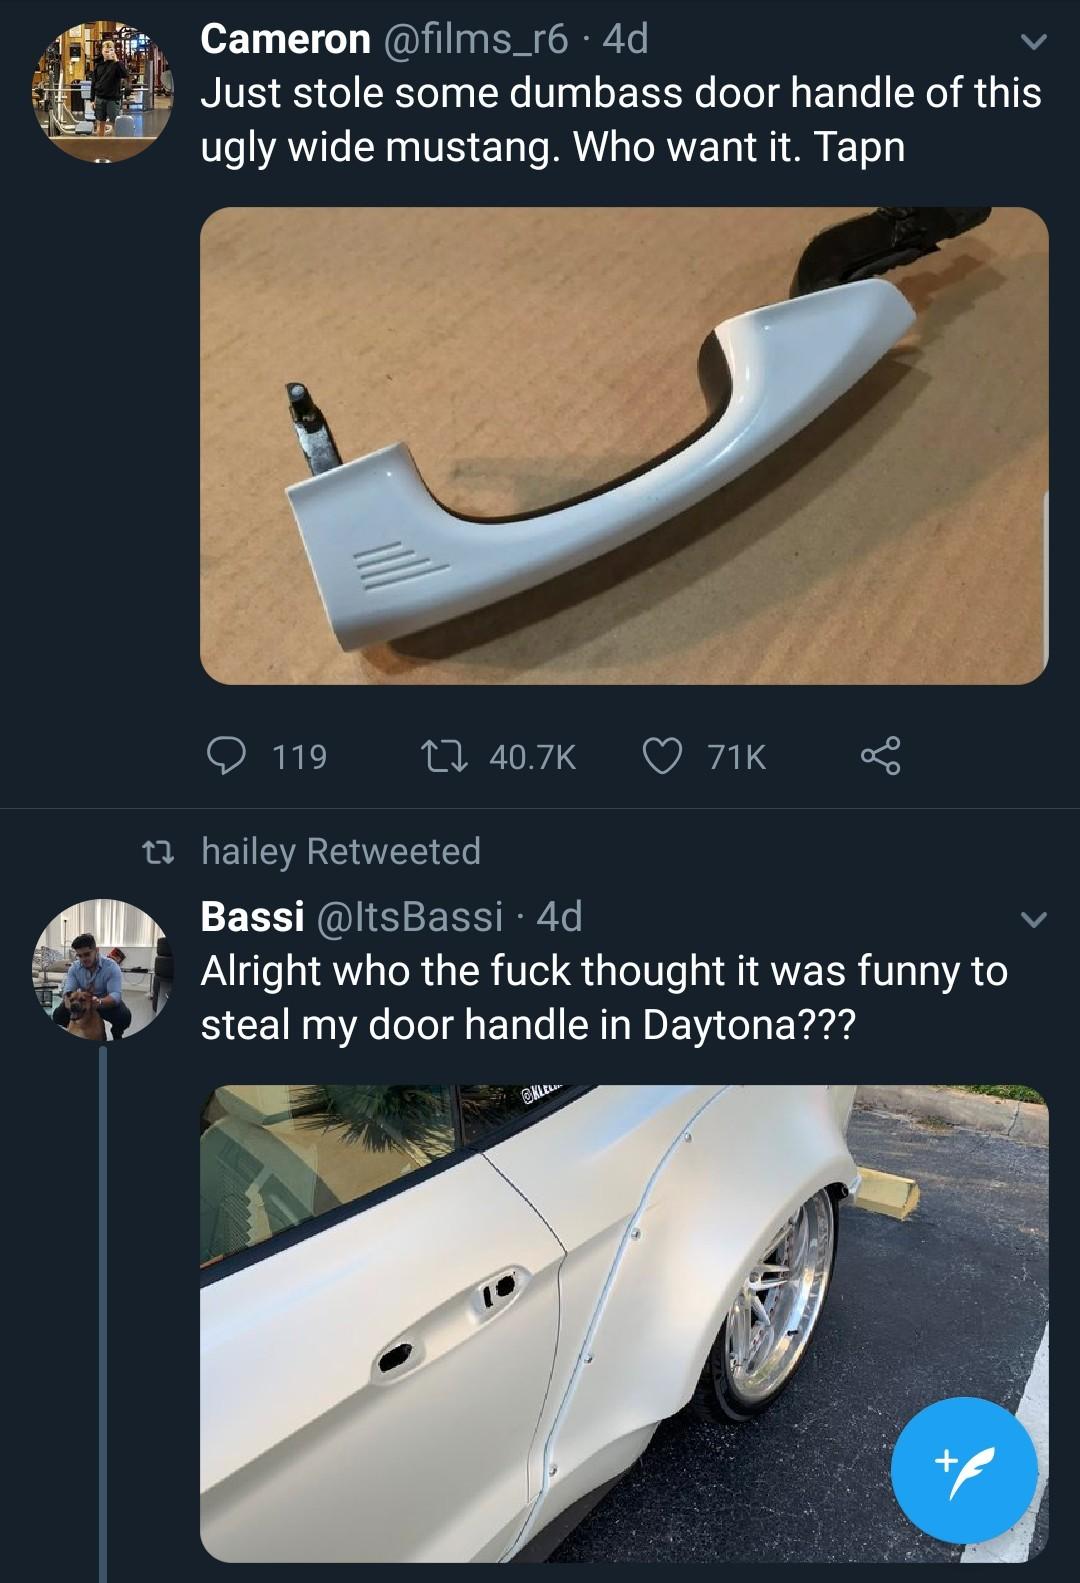 Get the handle - meme